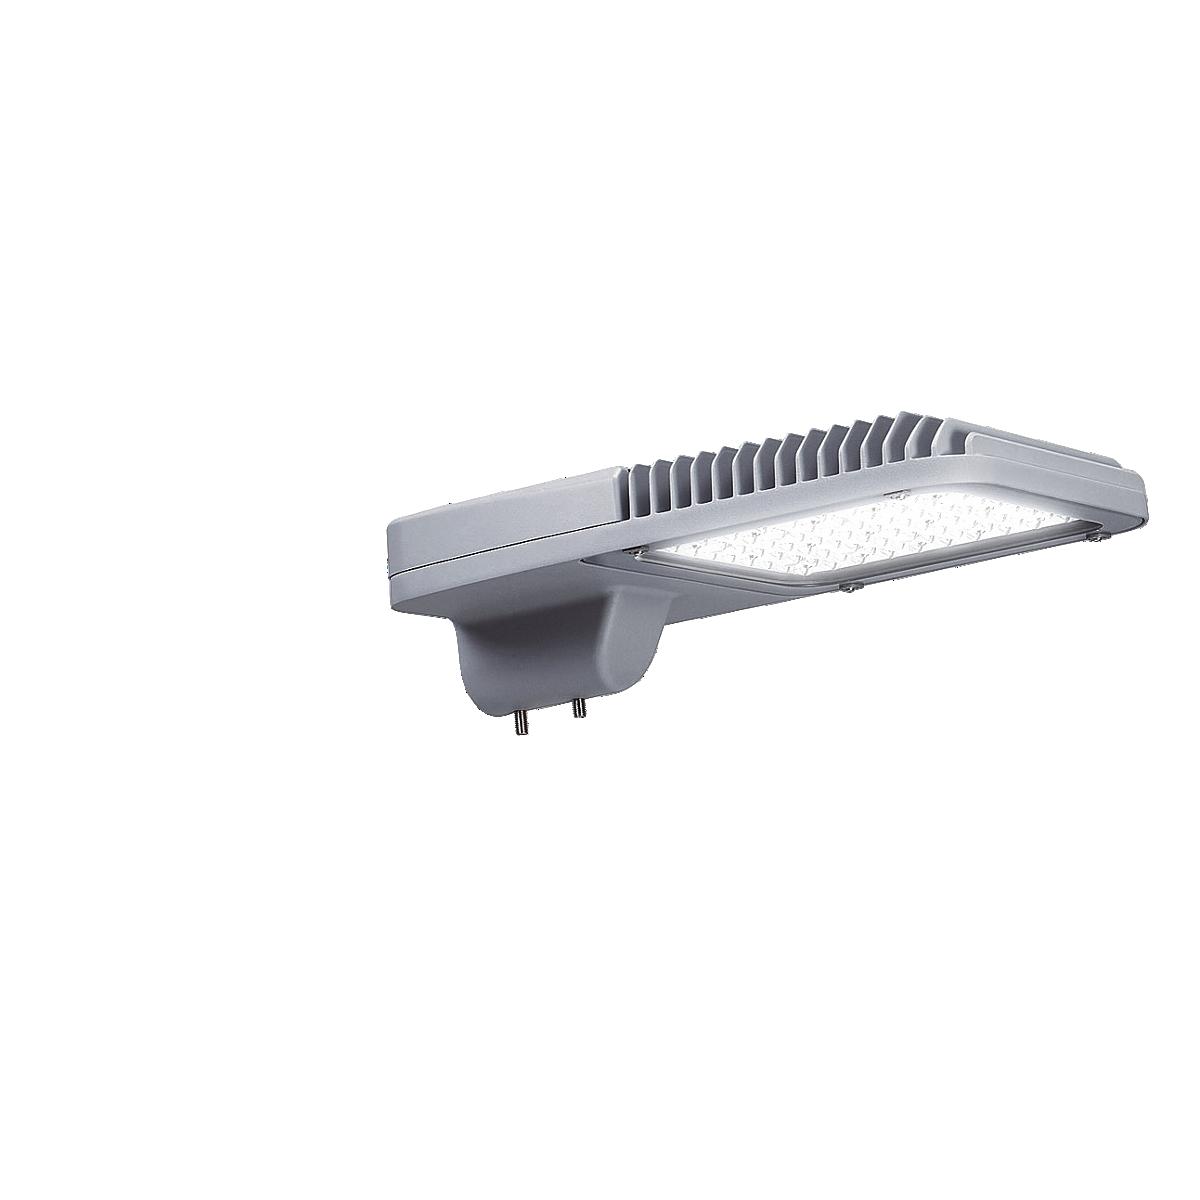 Greenvision Brp371 372 373 Road And Urban Luminaires Philips Lighting Esv00344 Circuit Diagram Scaricare